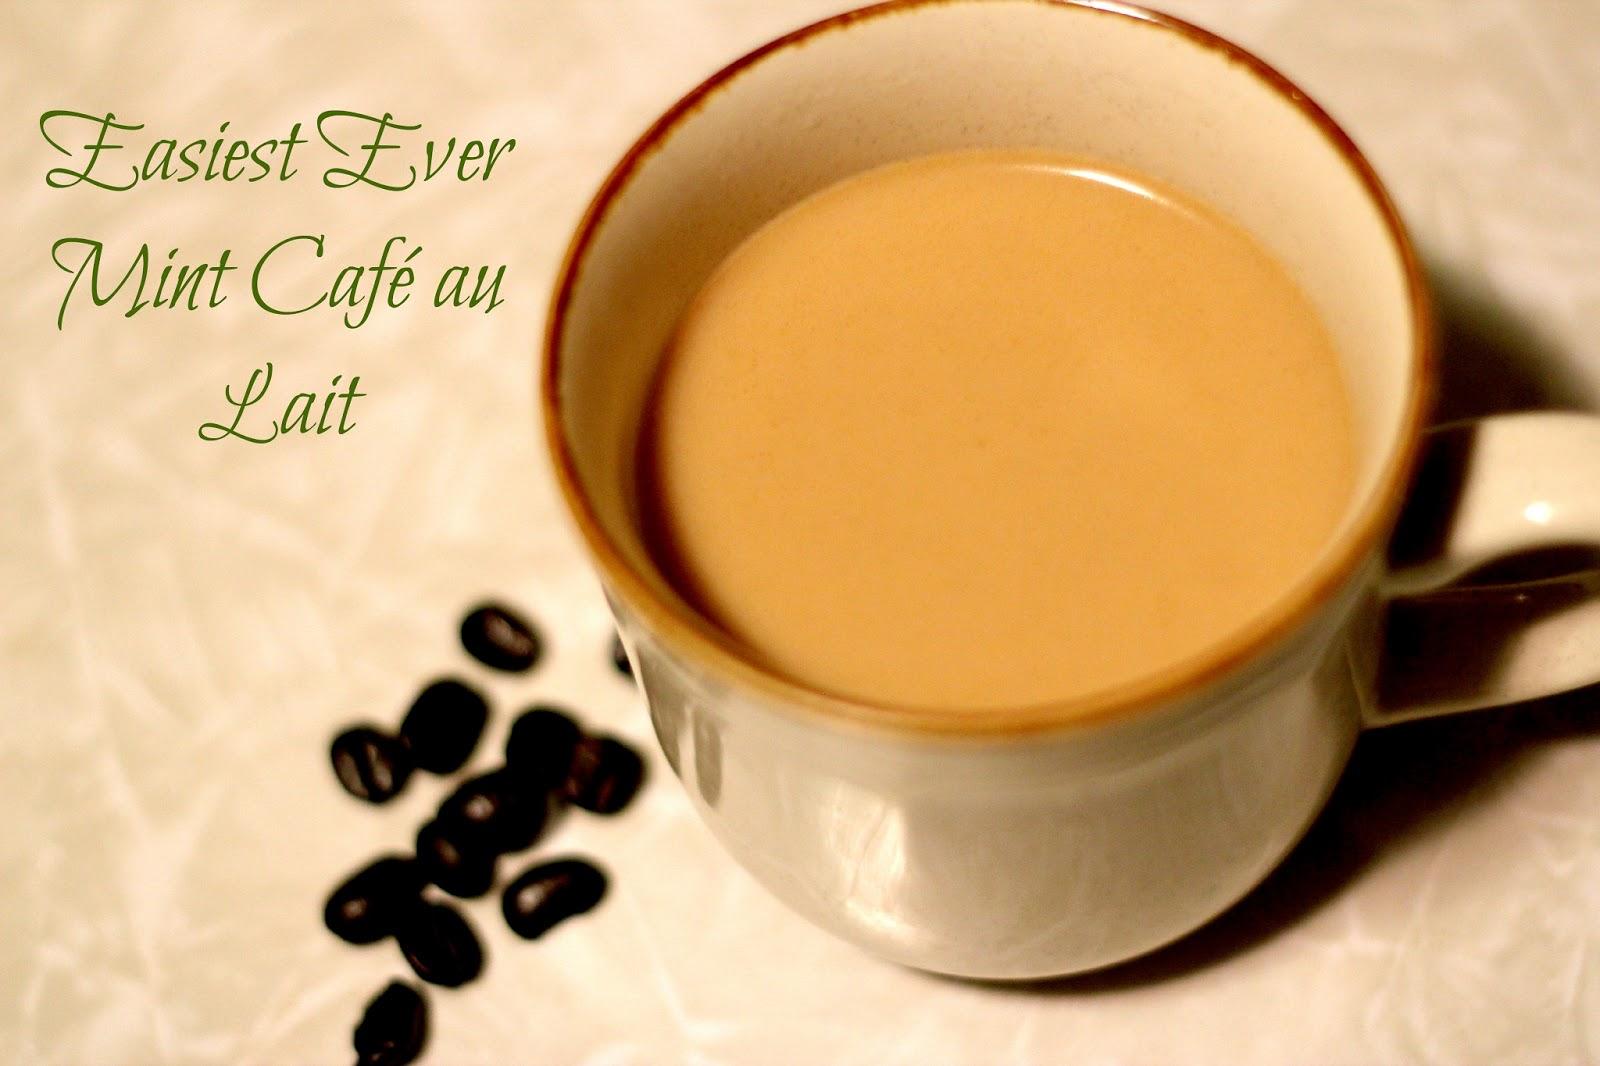 lille punkin 39 easy mint caf au lait with landmark coffee. Black Bedroom Furniture Sets. Home Design Ideas